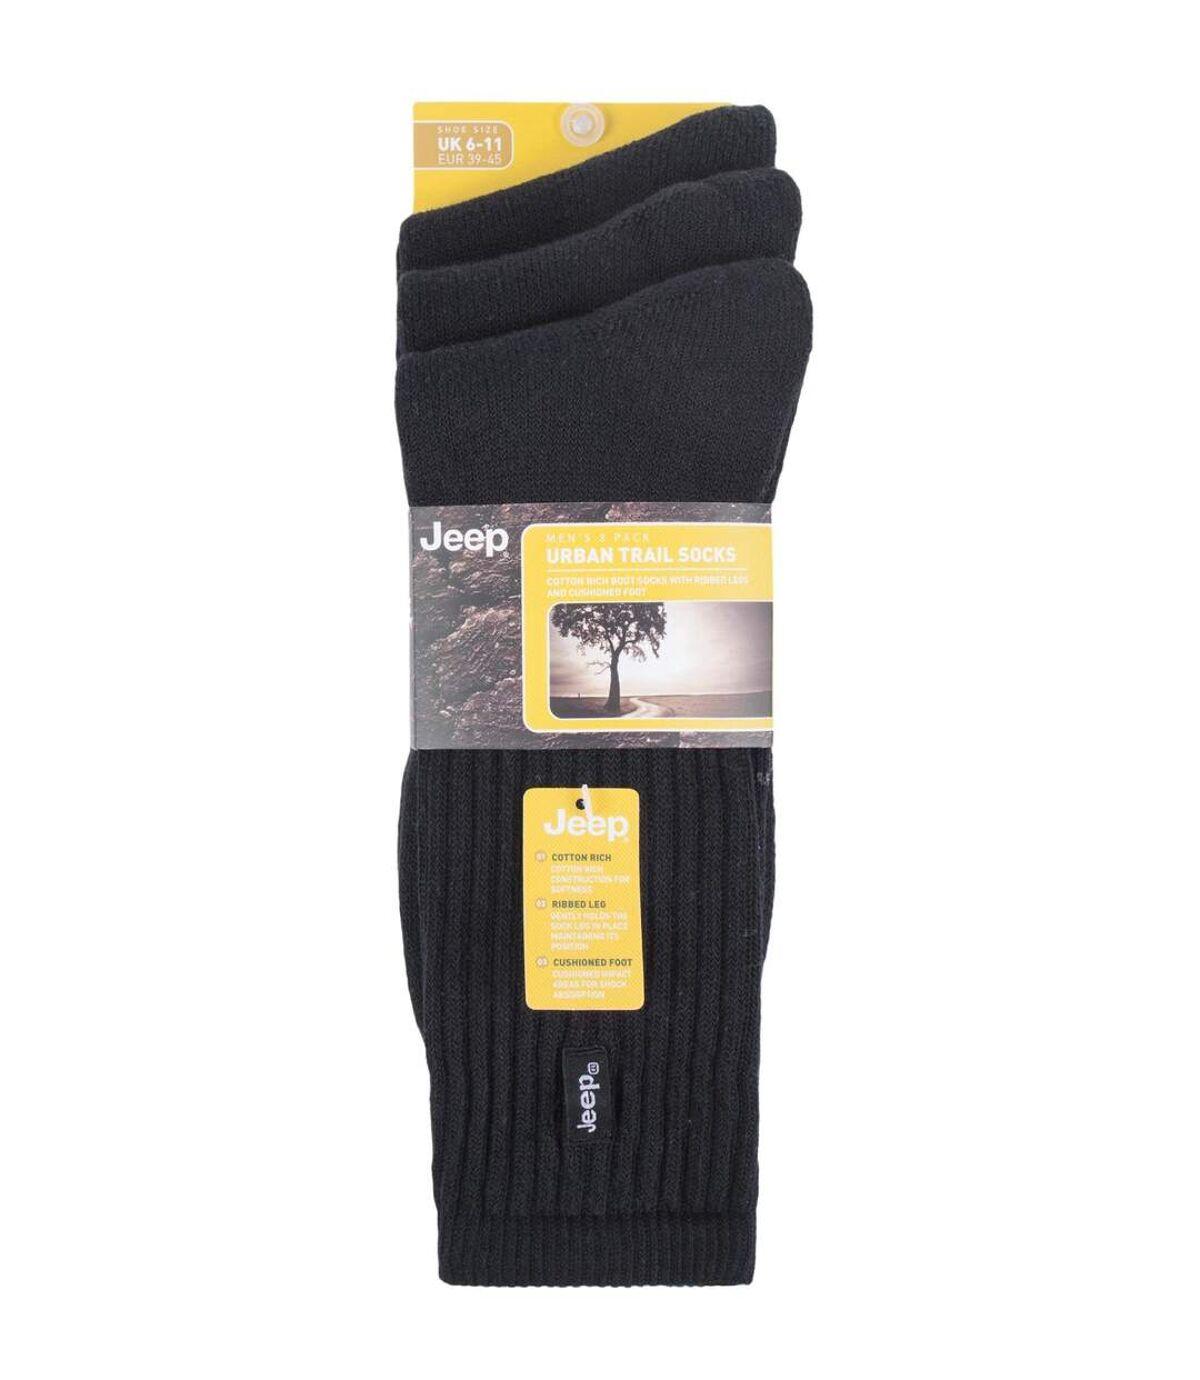 JEEP - 3 Pk Mens Vintage Cotton Cushioned Socks